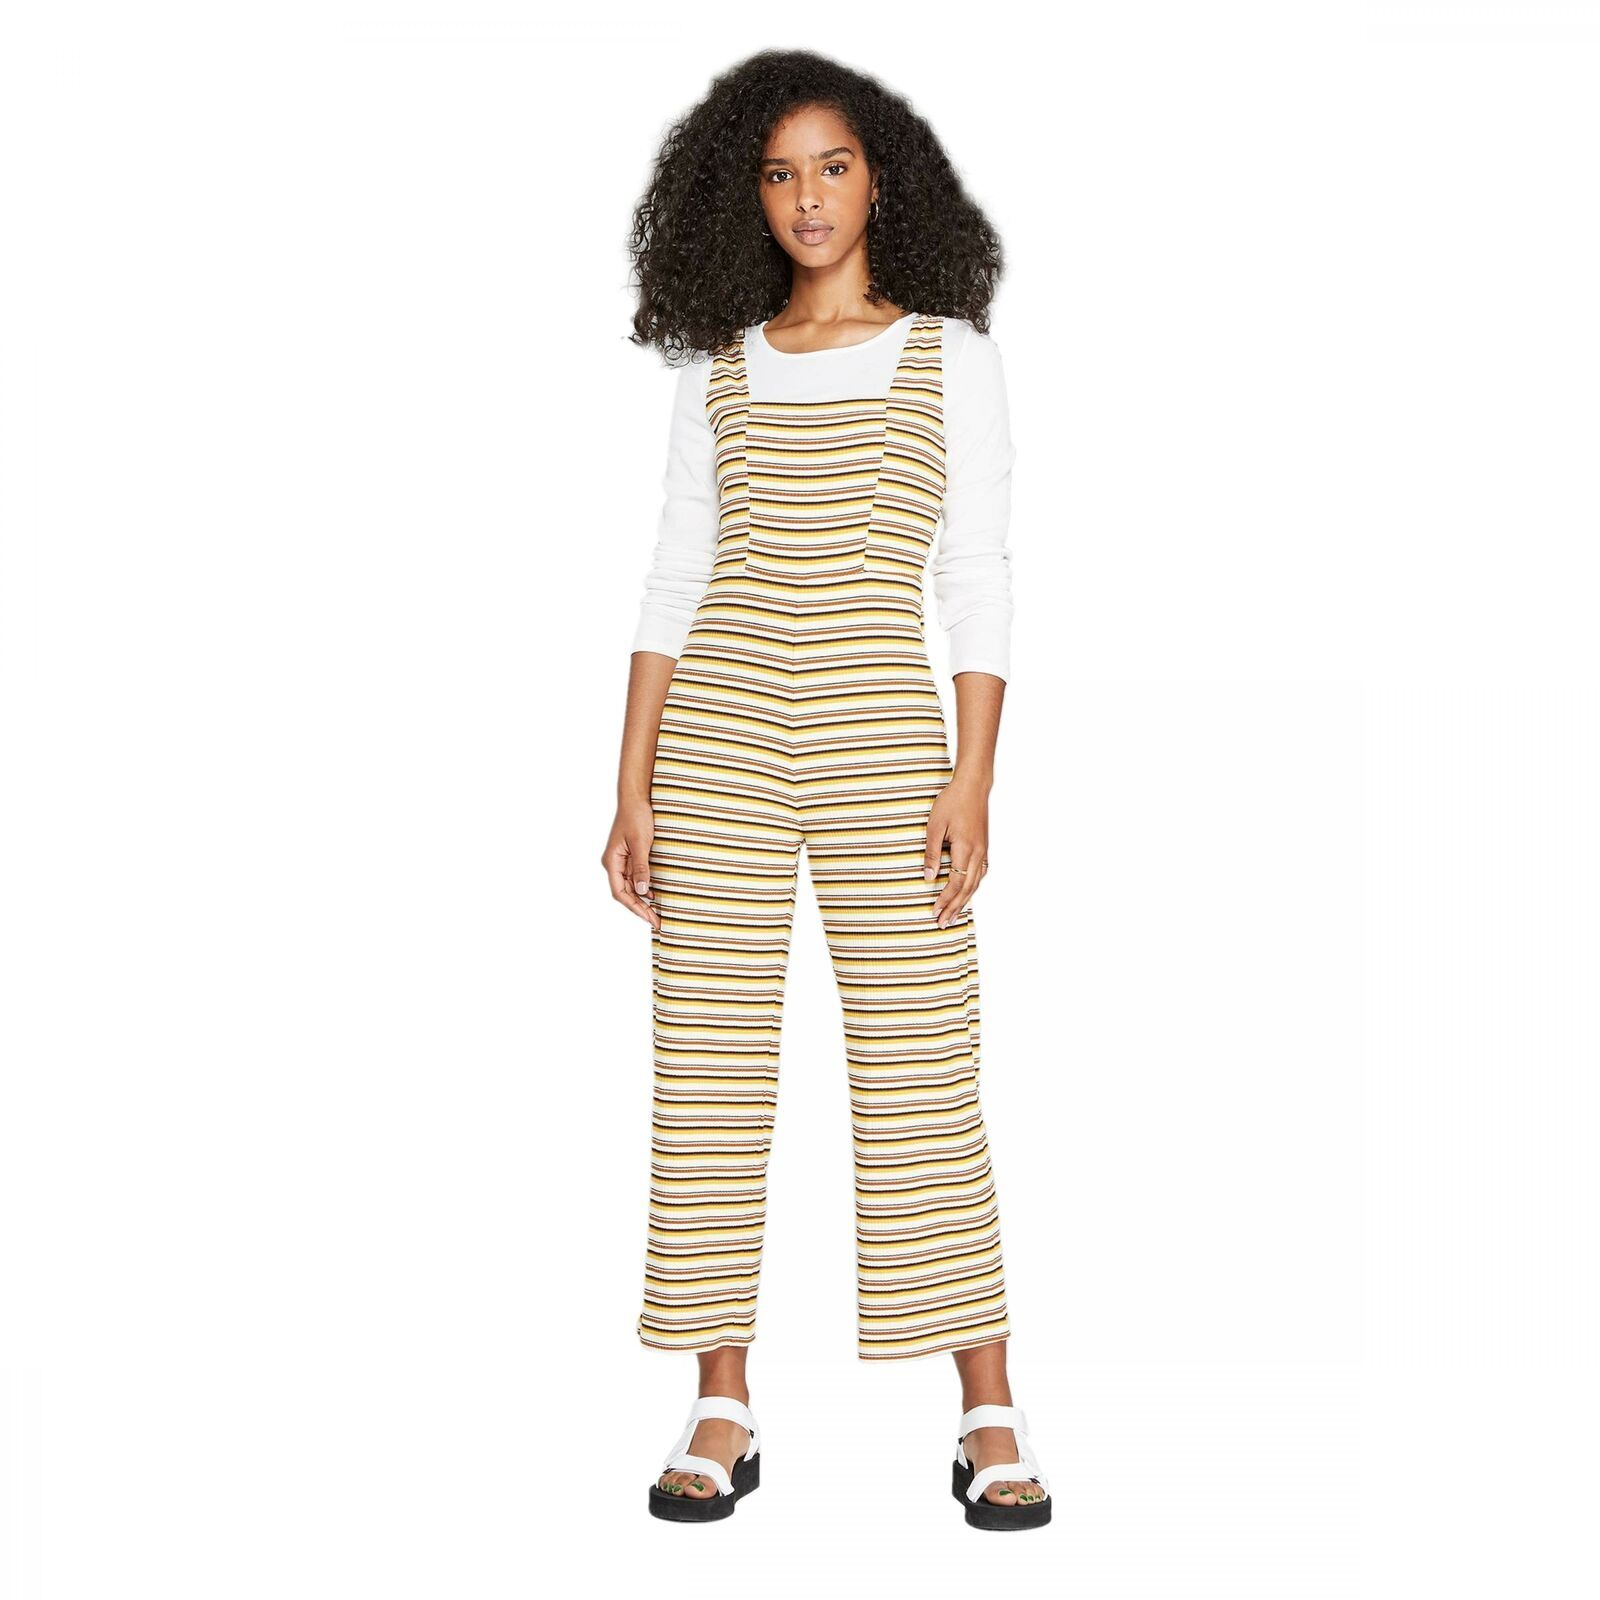 Wild Fable Womens Beige Striped Strappy Square Neck Cotton Overall